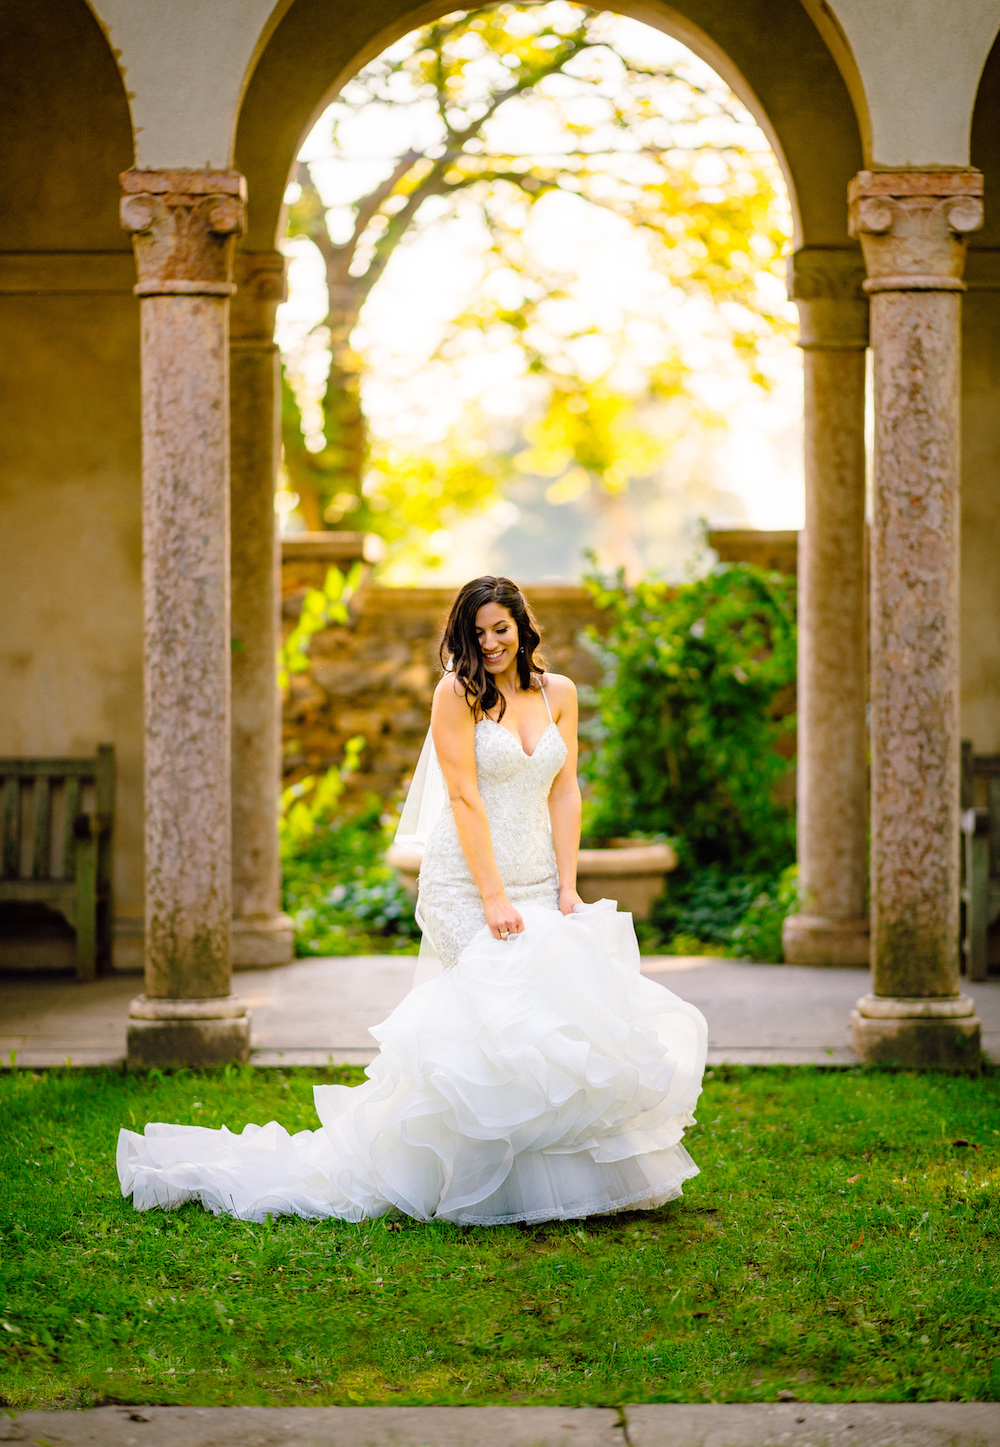 Gibraltar Gardens Wilmington DE Weddings by Matt Steeves Photography 7.jpg